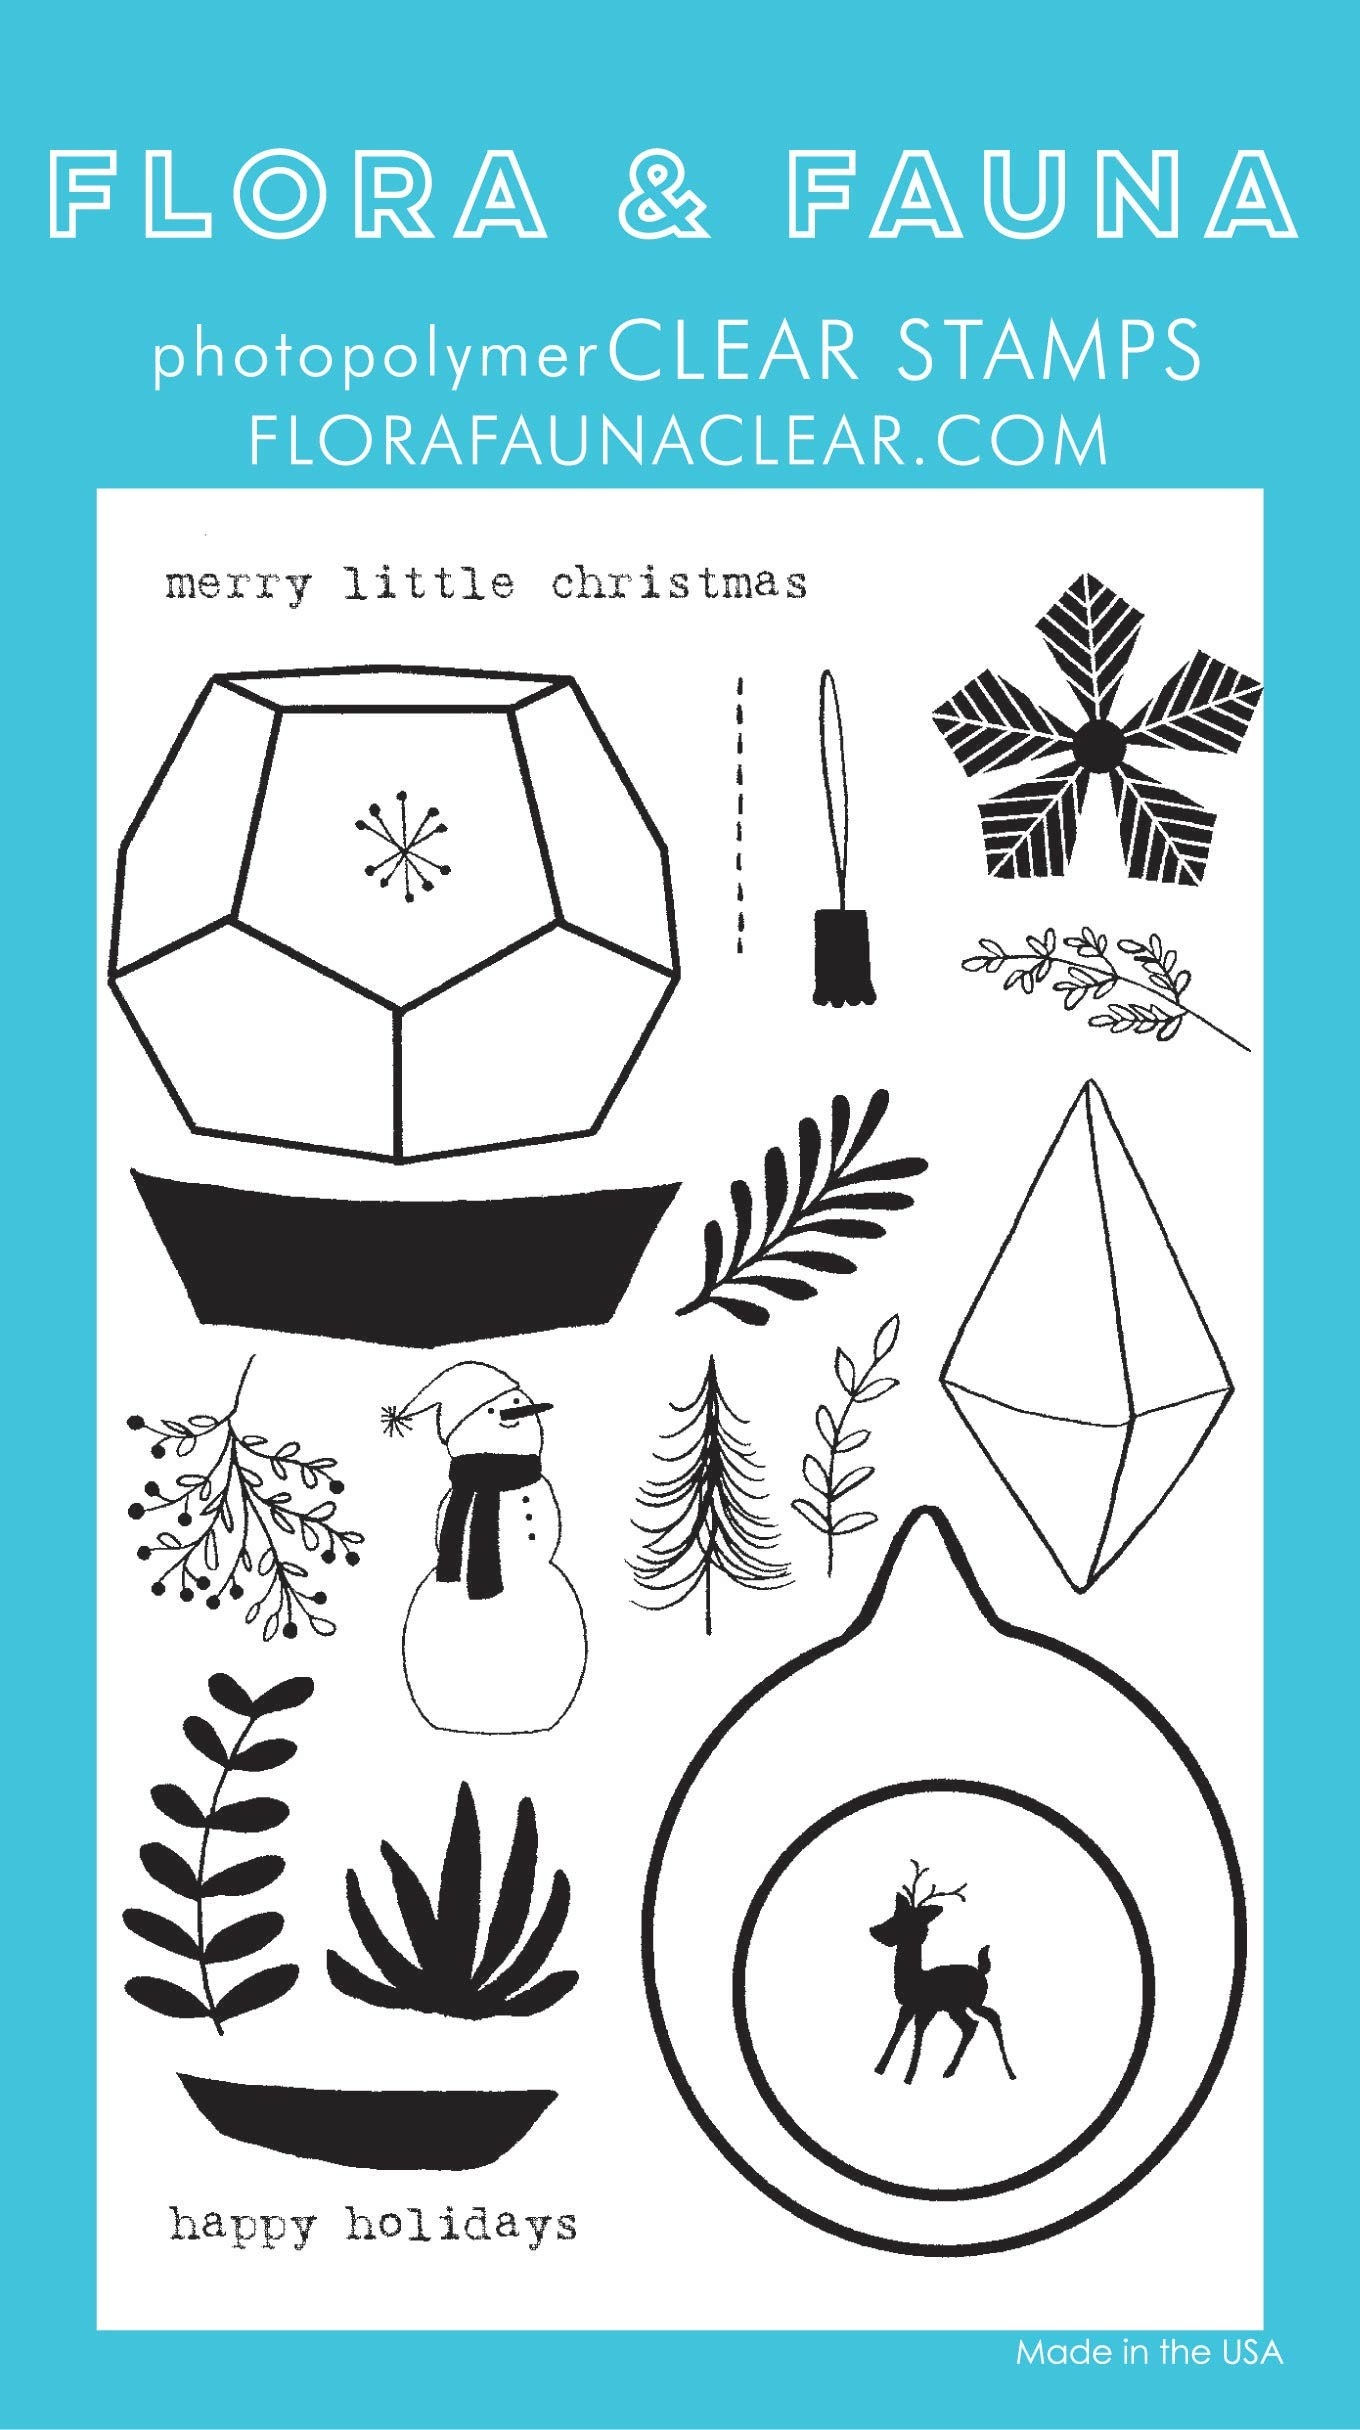 Flora & Fauna Holiday Terrarium Clear Stamp Set